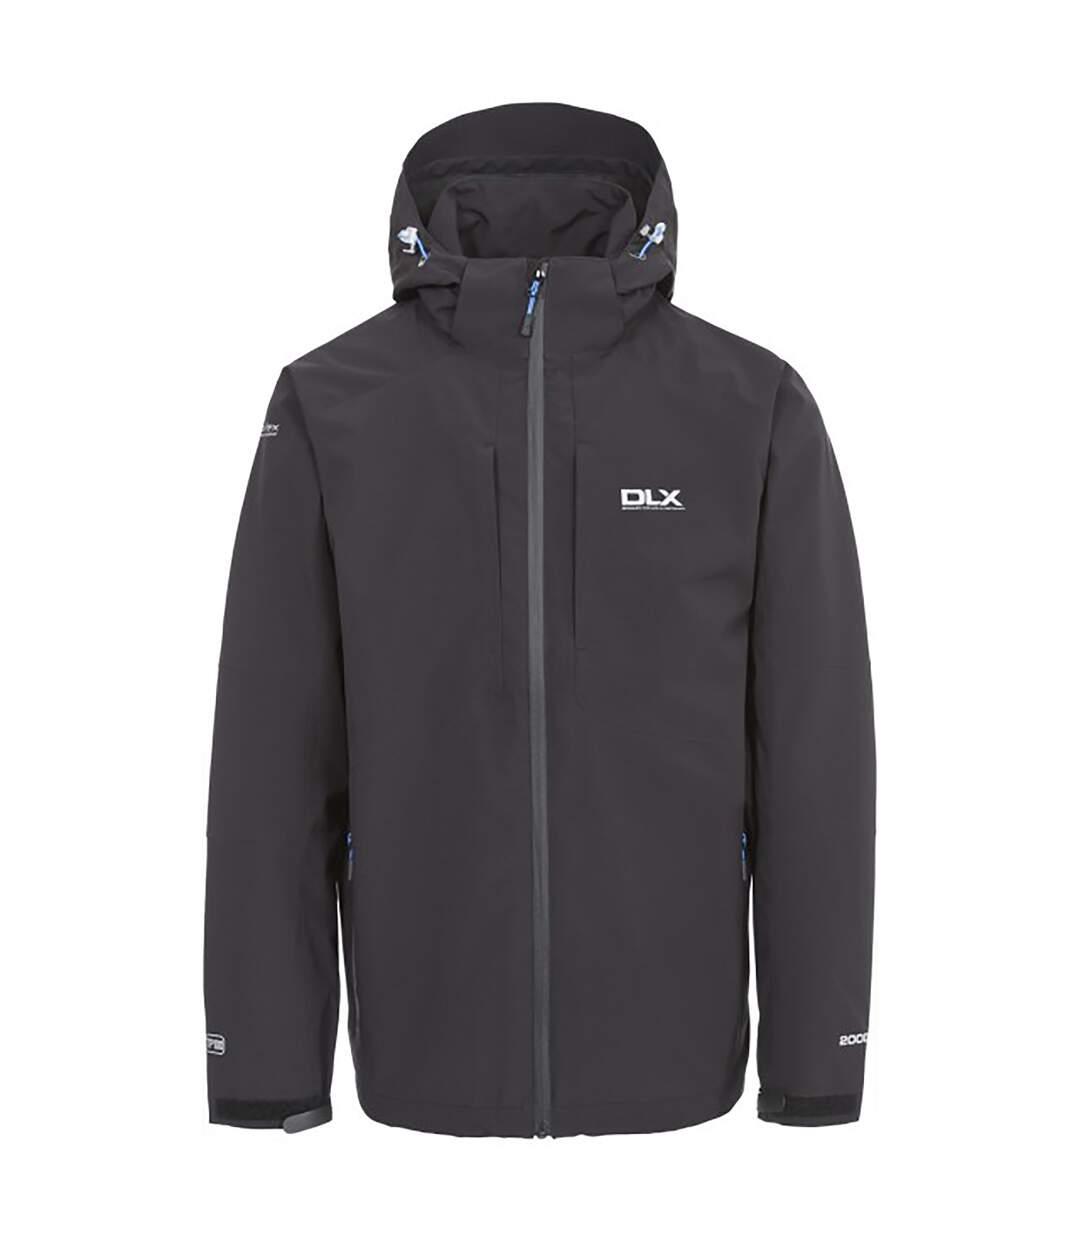 Trespass Mens Kumar Waterproof DLX Jacket (Black) - UTTP3286